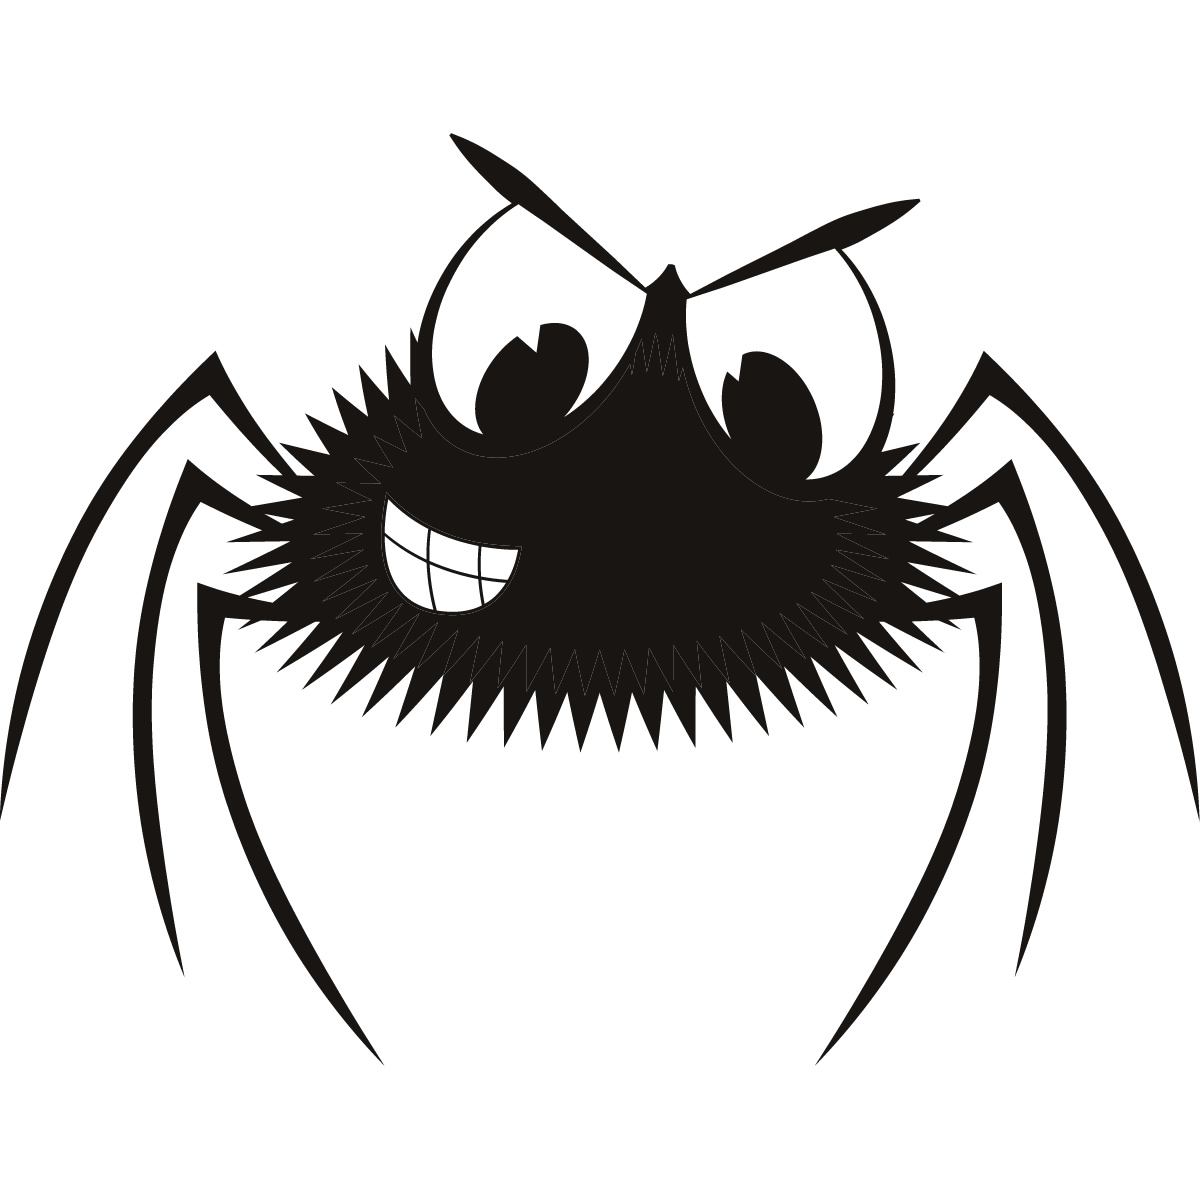 Cartoon Spider Images